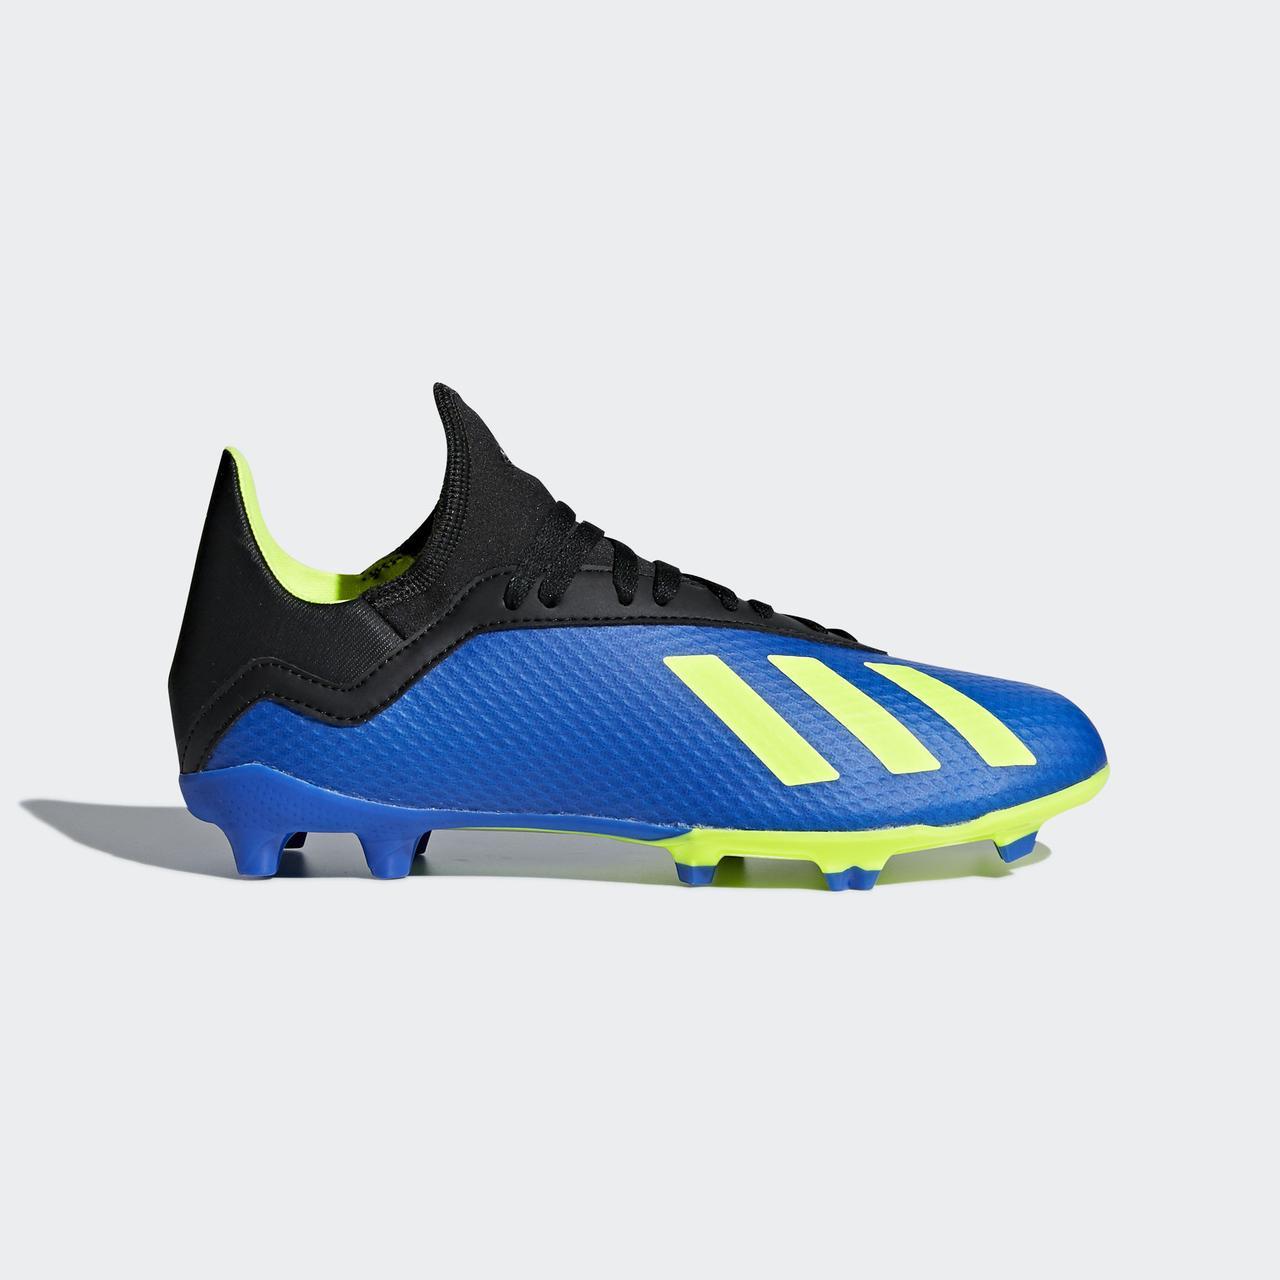 3faa1d182ef9 Детские футбольные бутсы Adidas Performance X 18.3 FG (Артикул  DB2416)